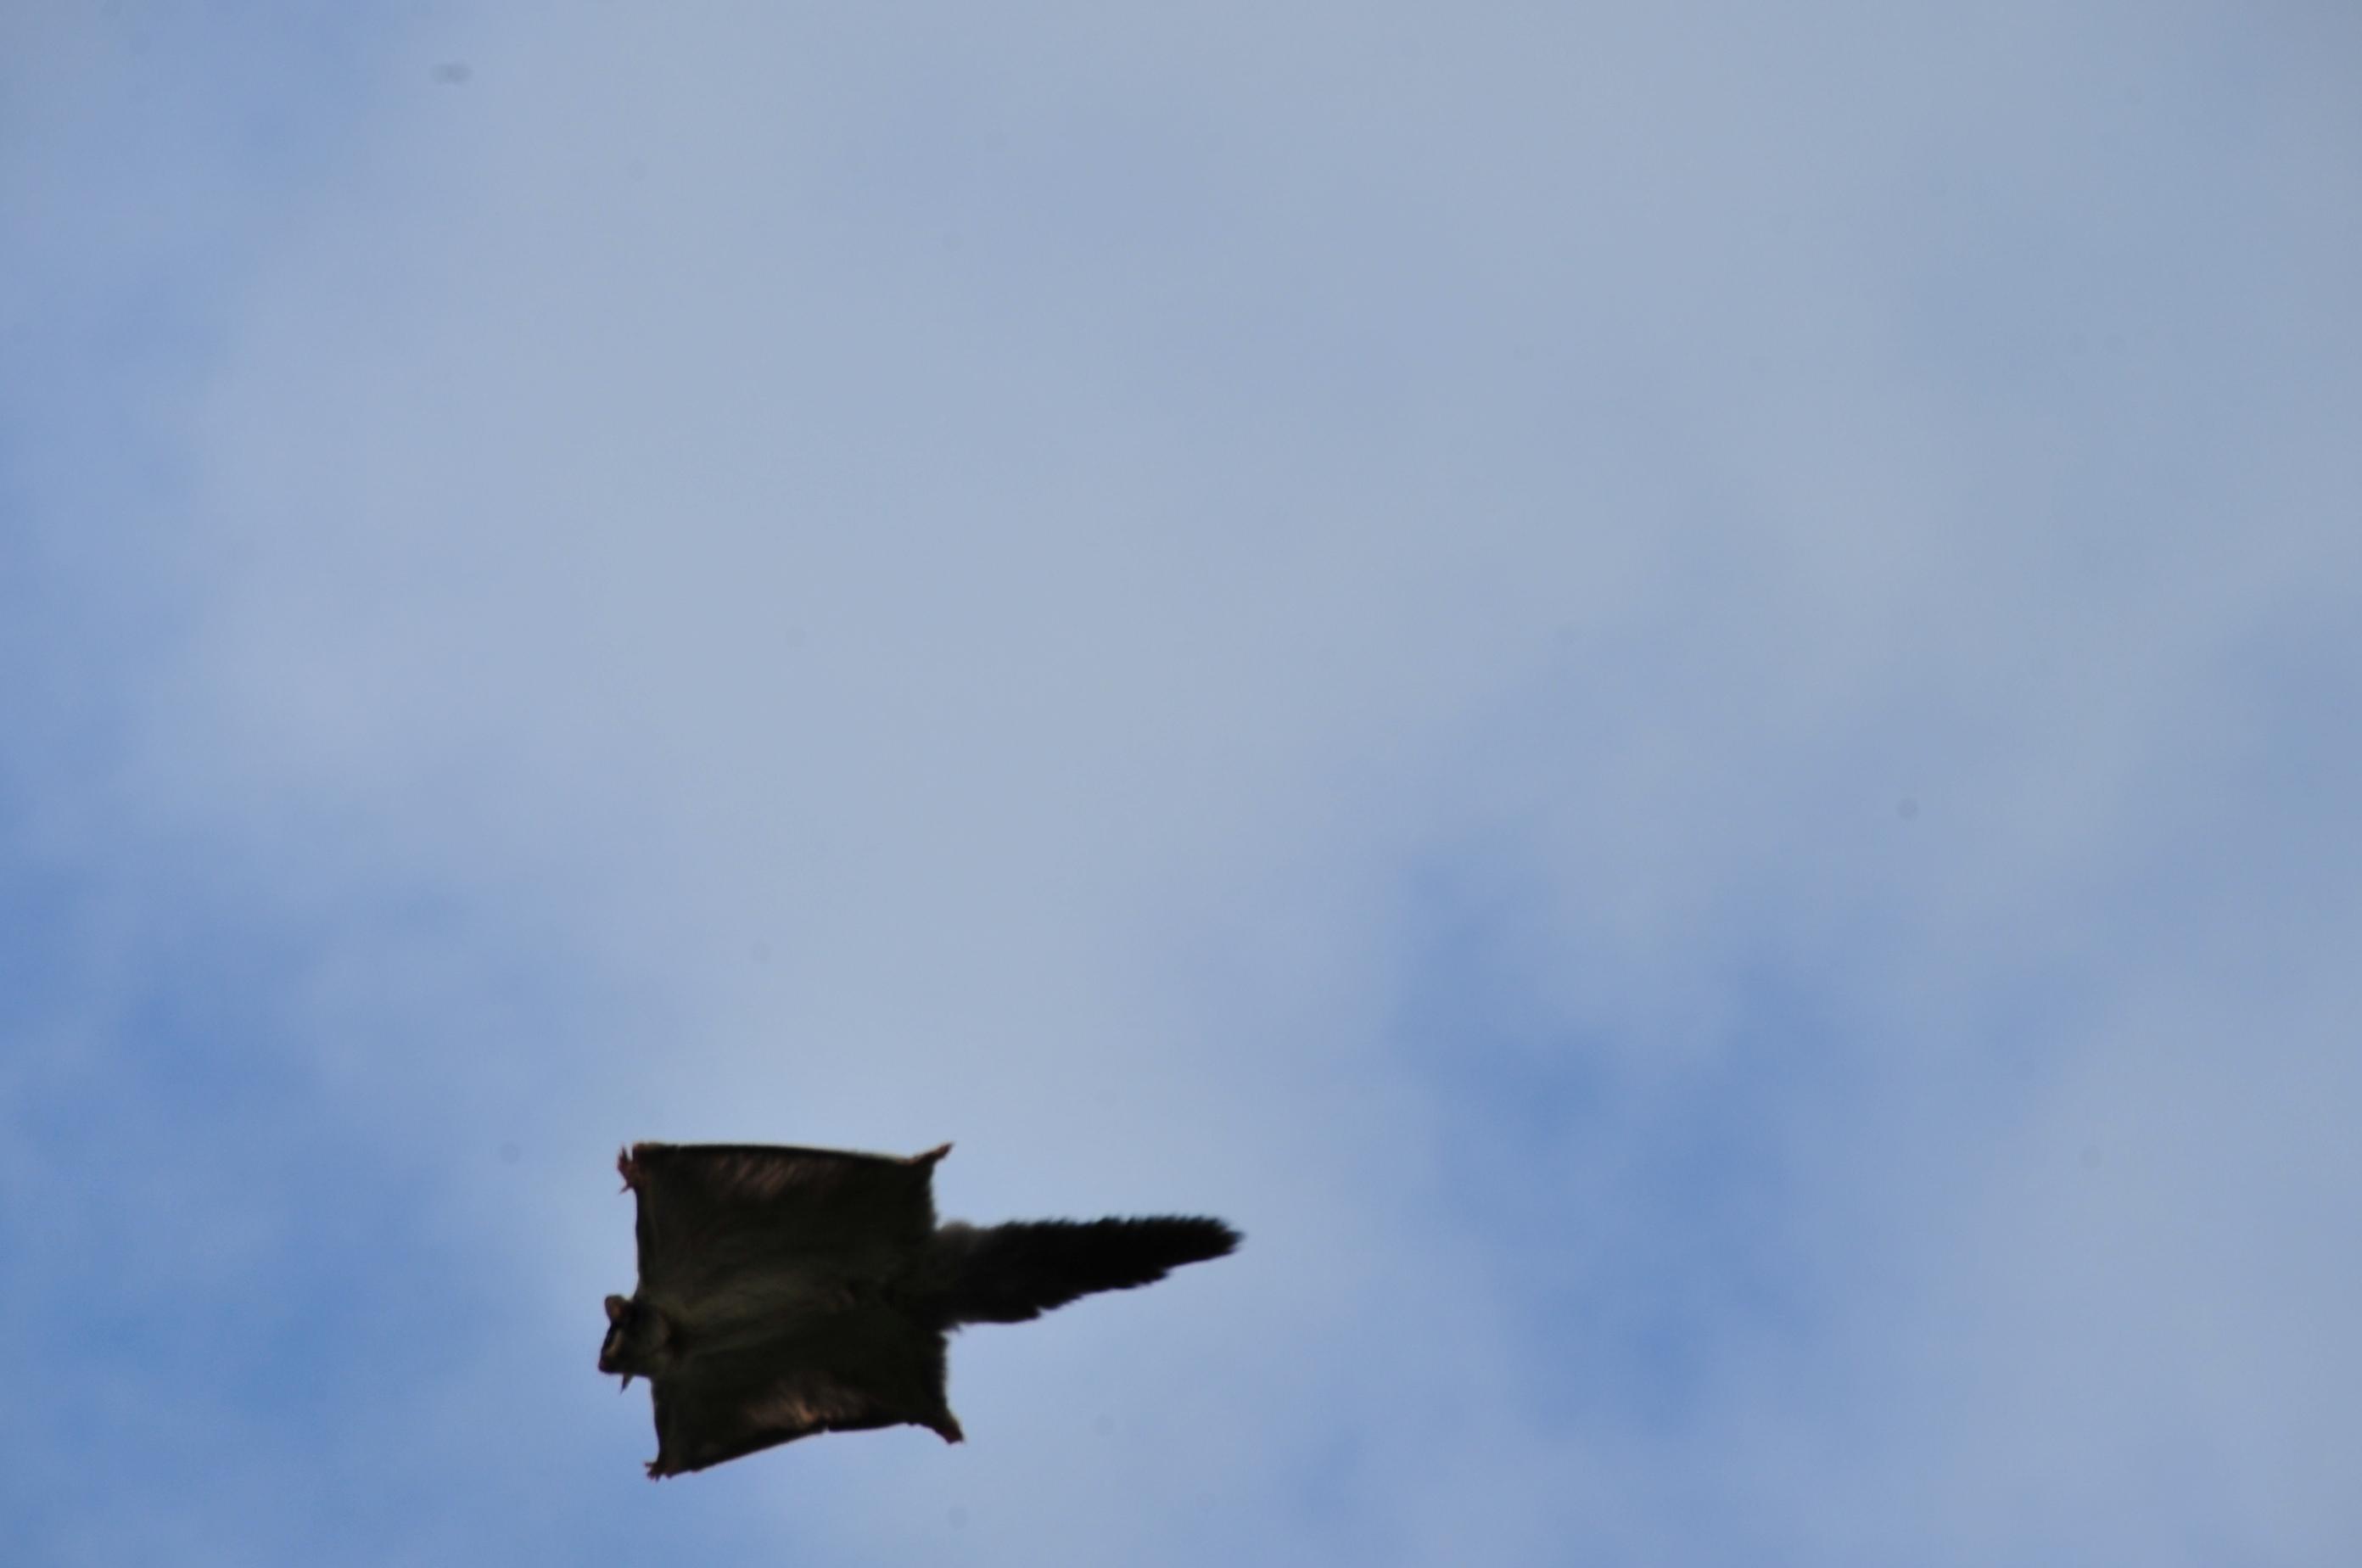 Squirrel Glider mid flight (Alex Bonazzi, 2009)